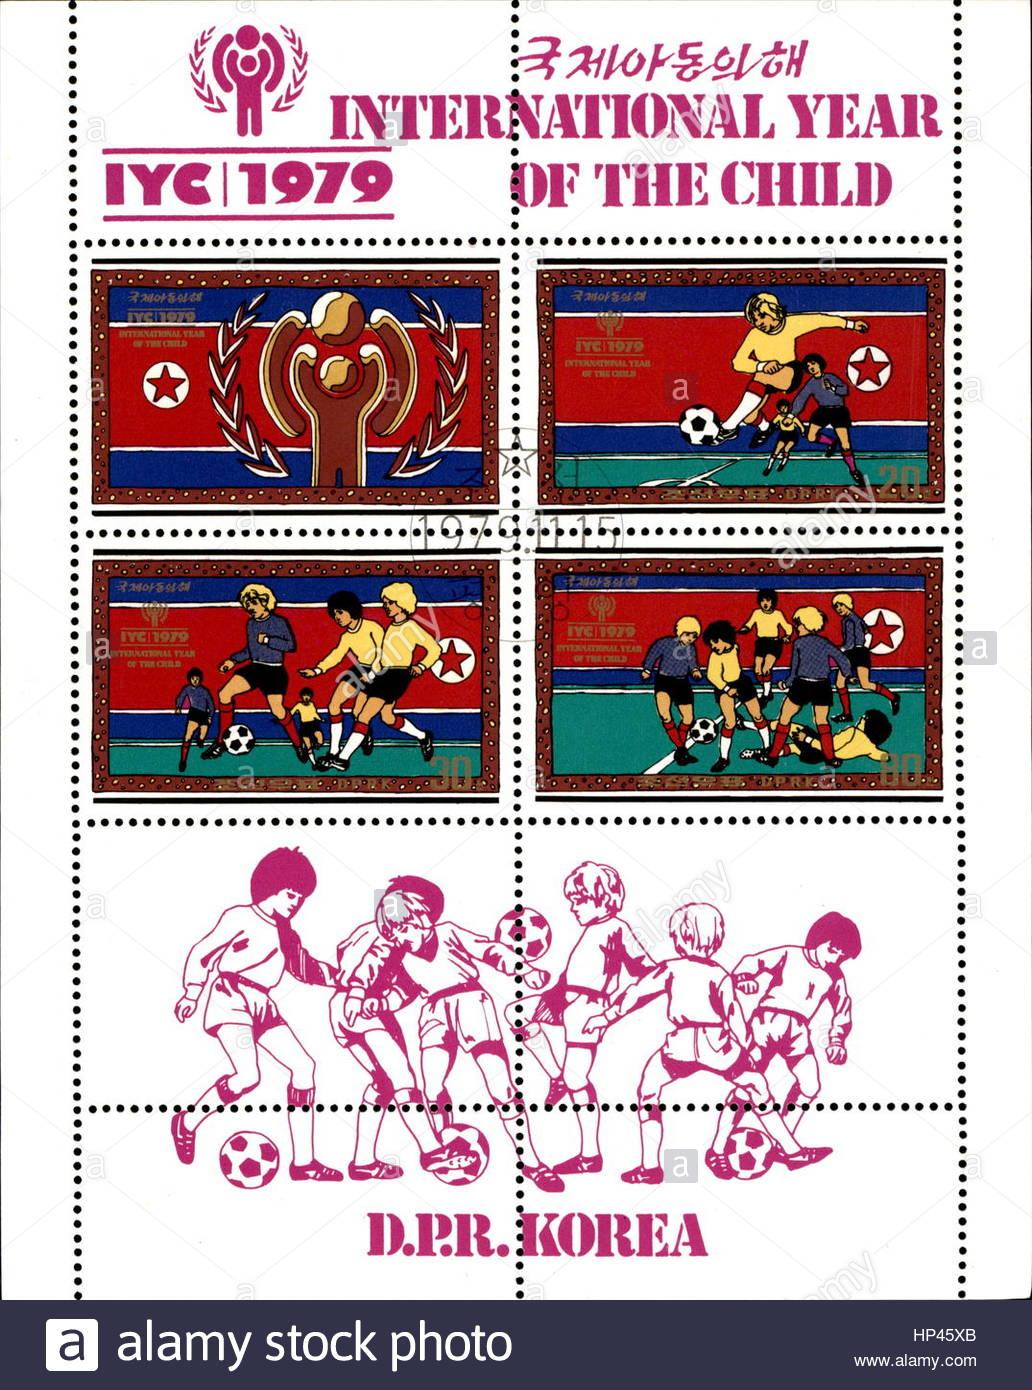 1979 international year of the child-Rare North Korean vintage postage stamp - Stock Image